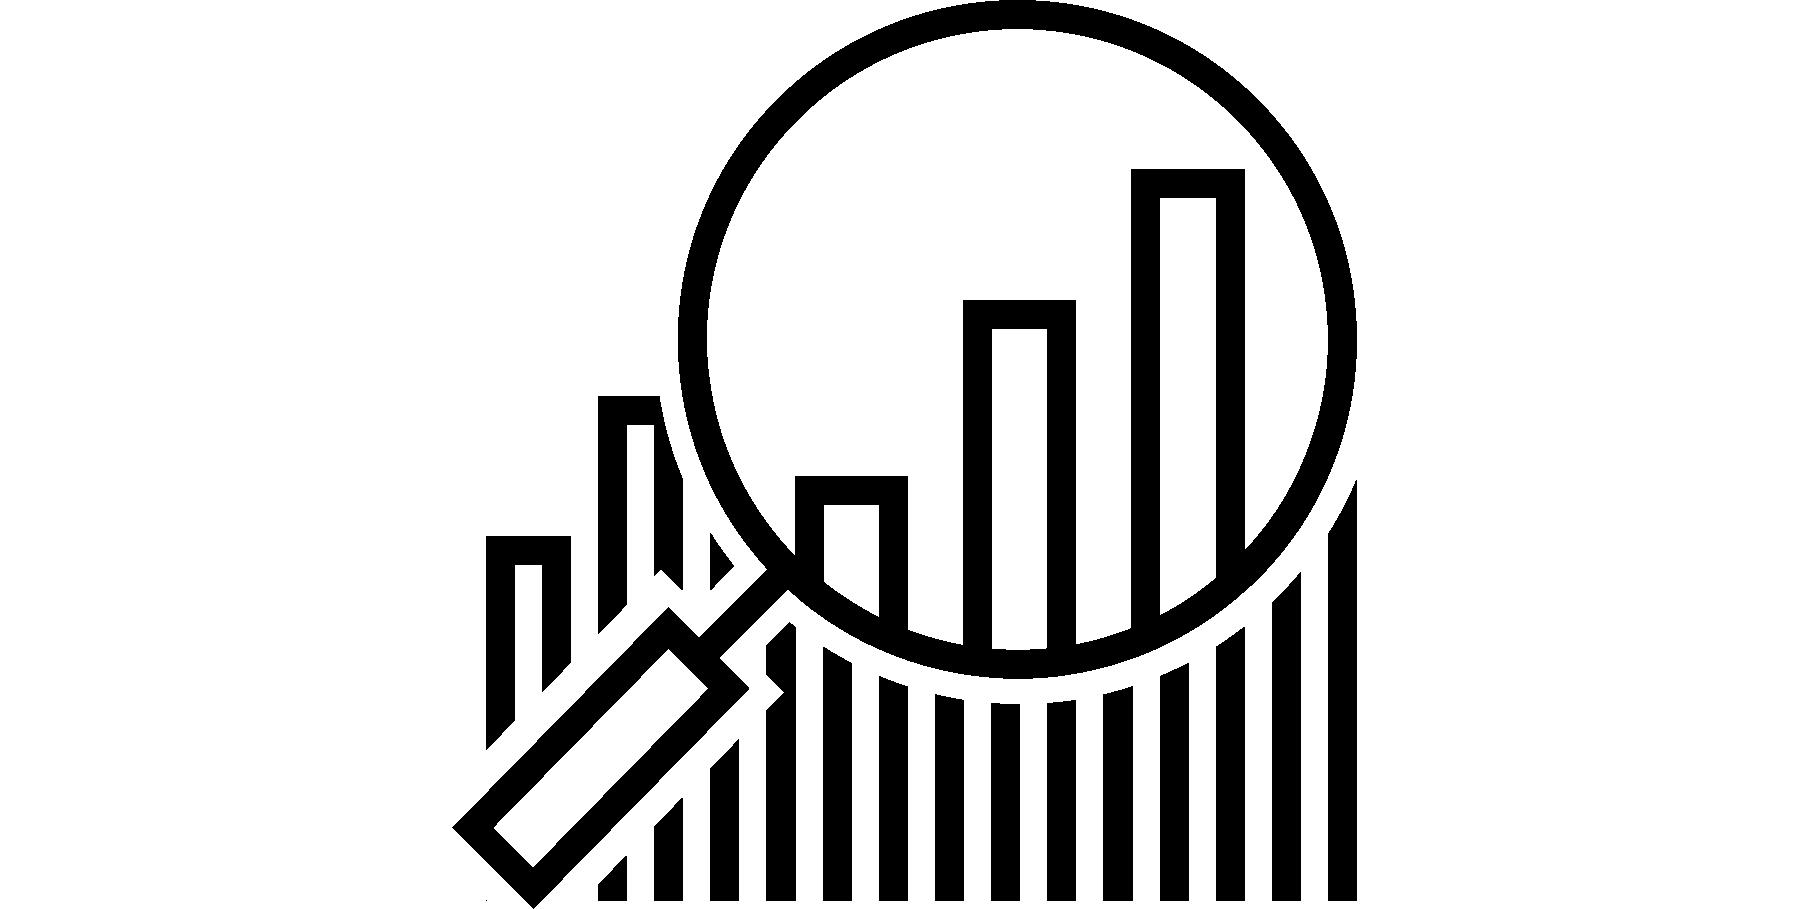 Search Bar Graph Icon